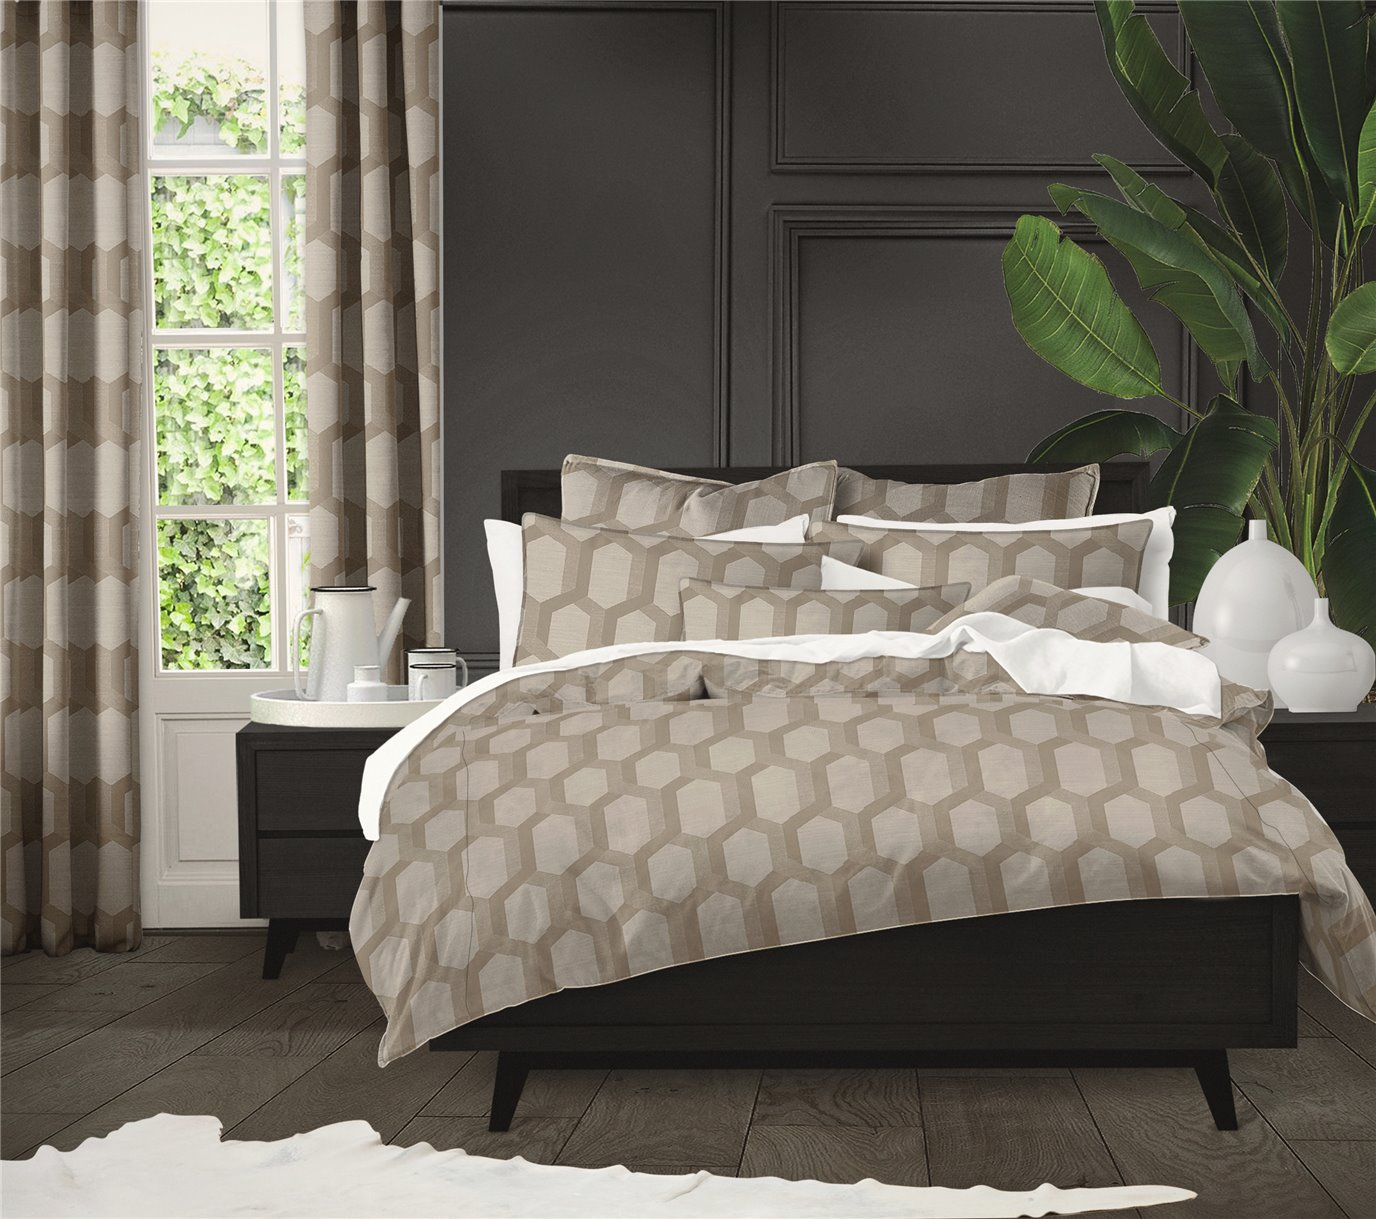 Maidstone Taupe Comforter Set - Full